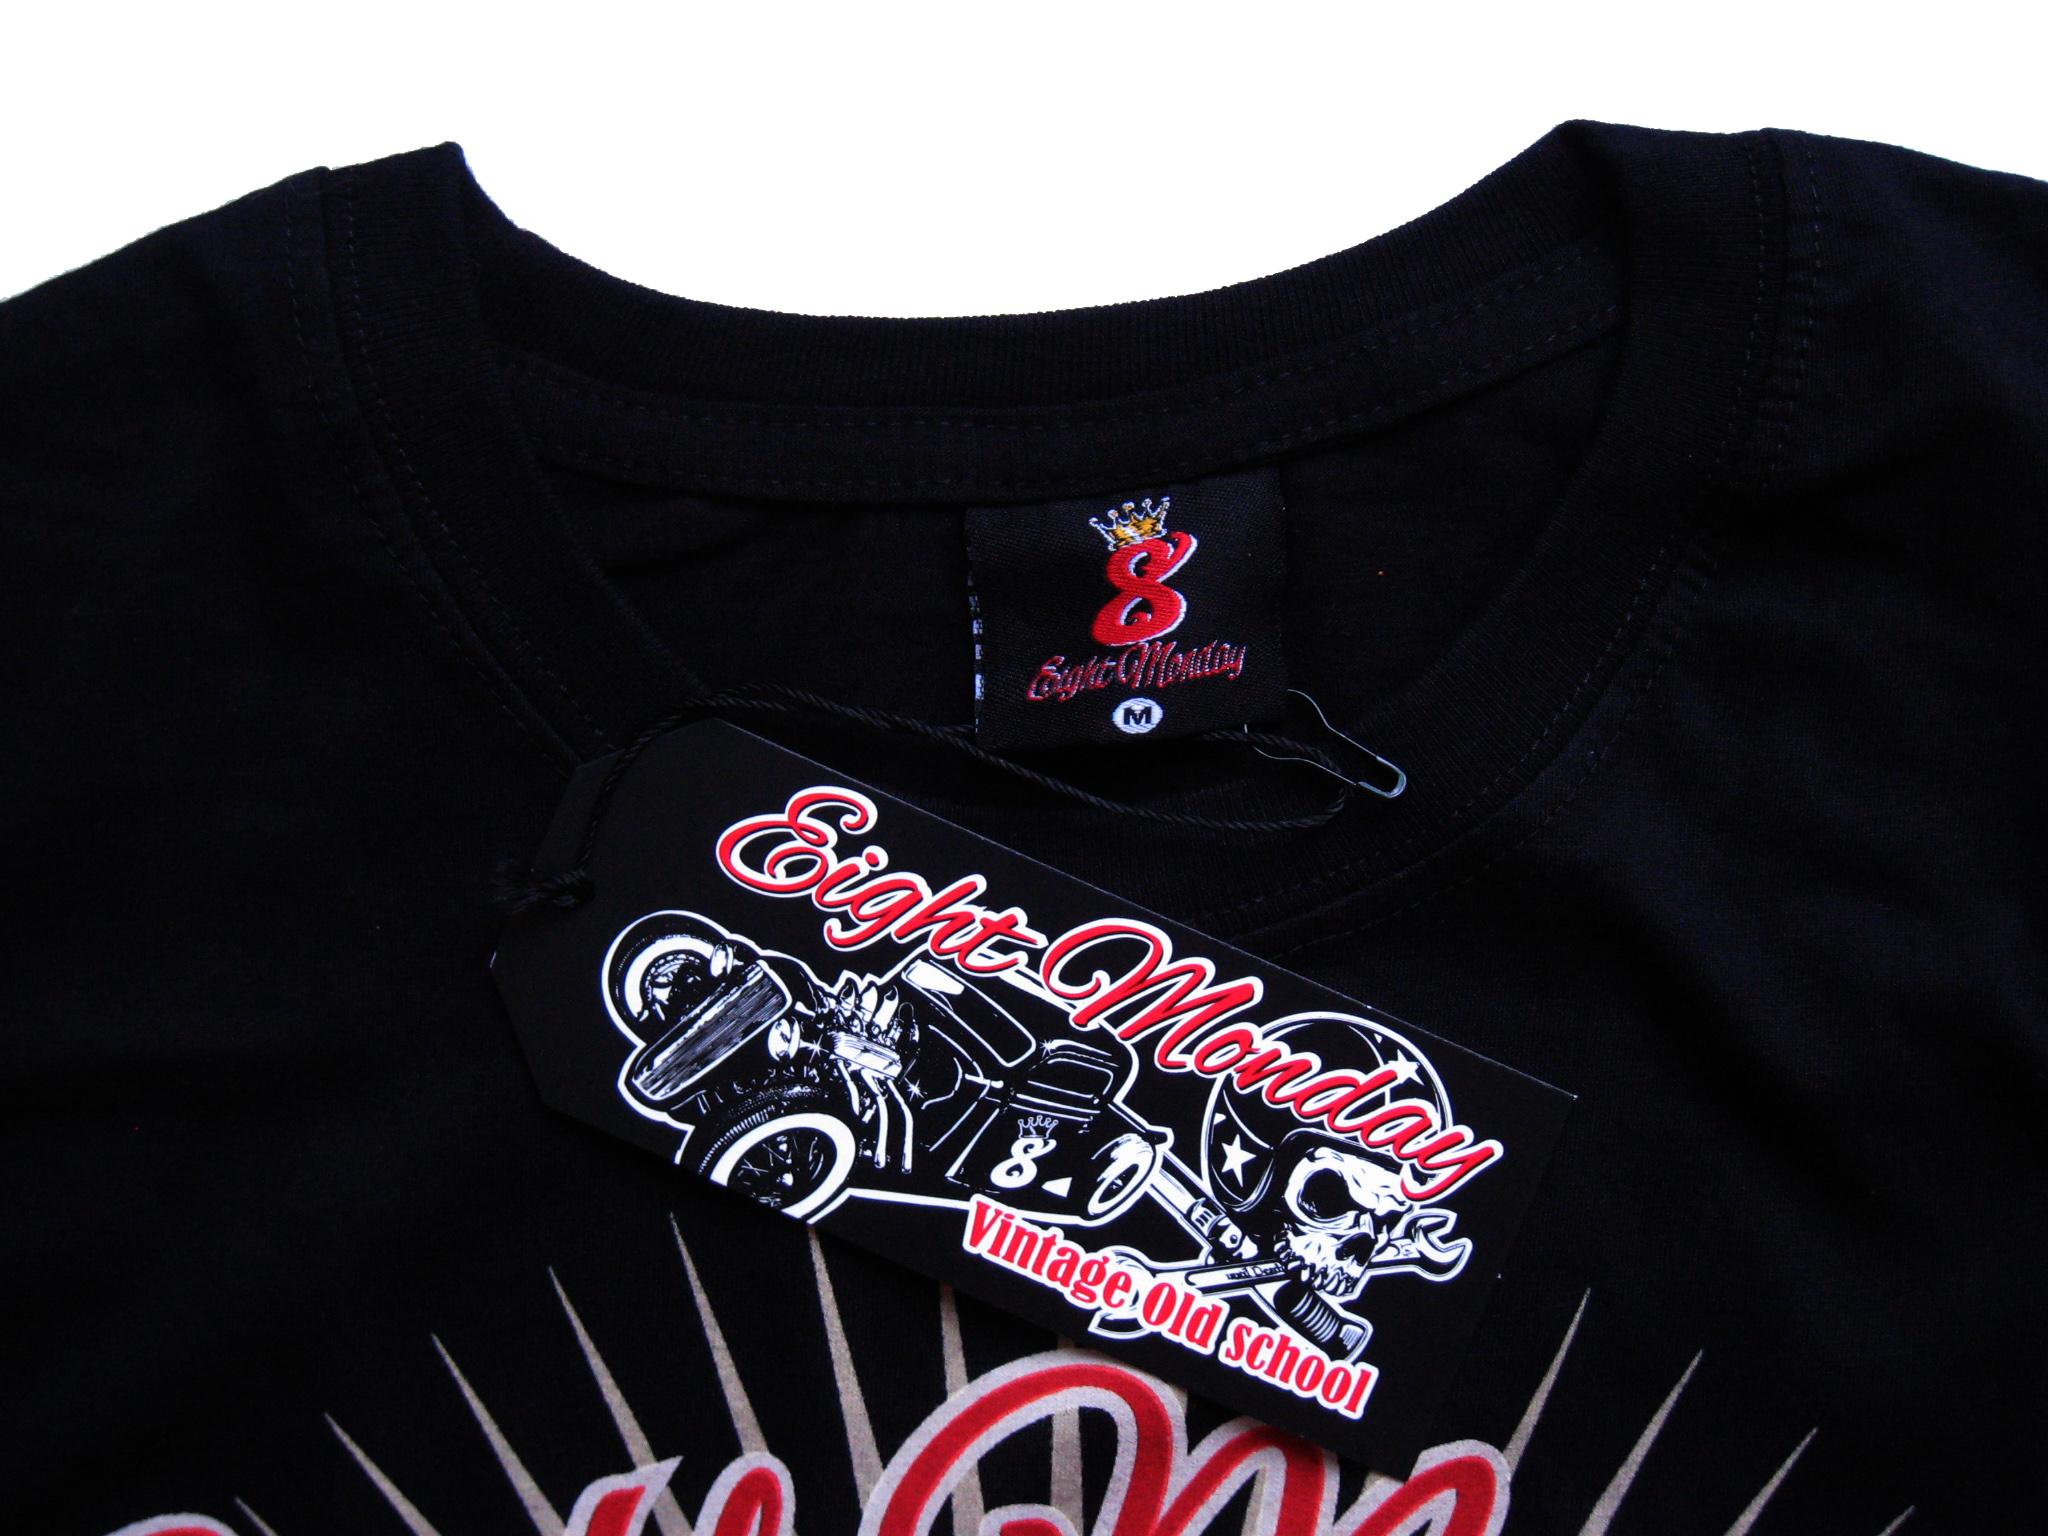 eight_monday_rockabilly_mens_shirt_custom_cars_hot_rod_skull_rock_em04_t_shirts_5.jpg